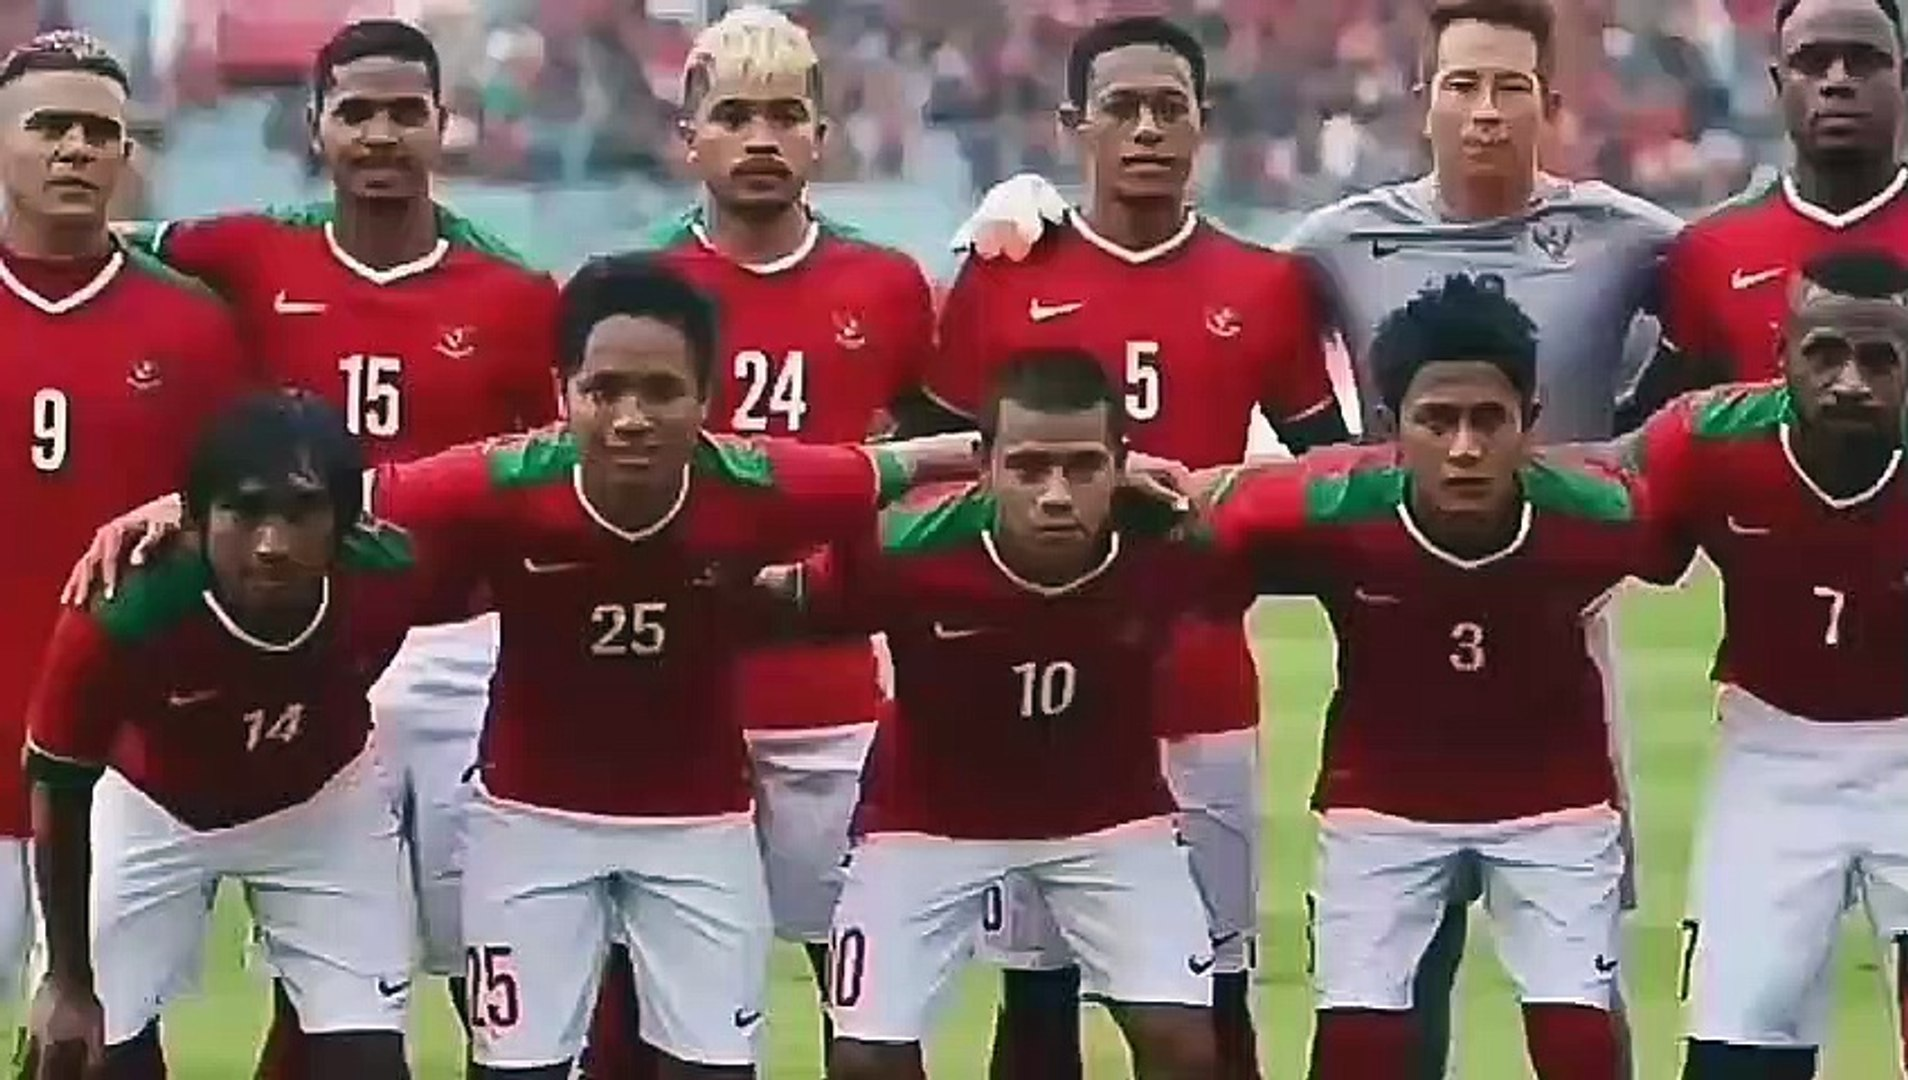 INDONESIA U 22 VS KAMBOJA U 22  FULL TIME  2 - 0 GROUP STAGE AFF U 22 KAMBOJA 2019 FULL GOL AND HIGH